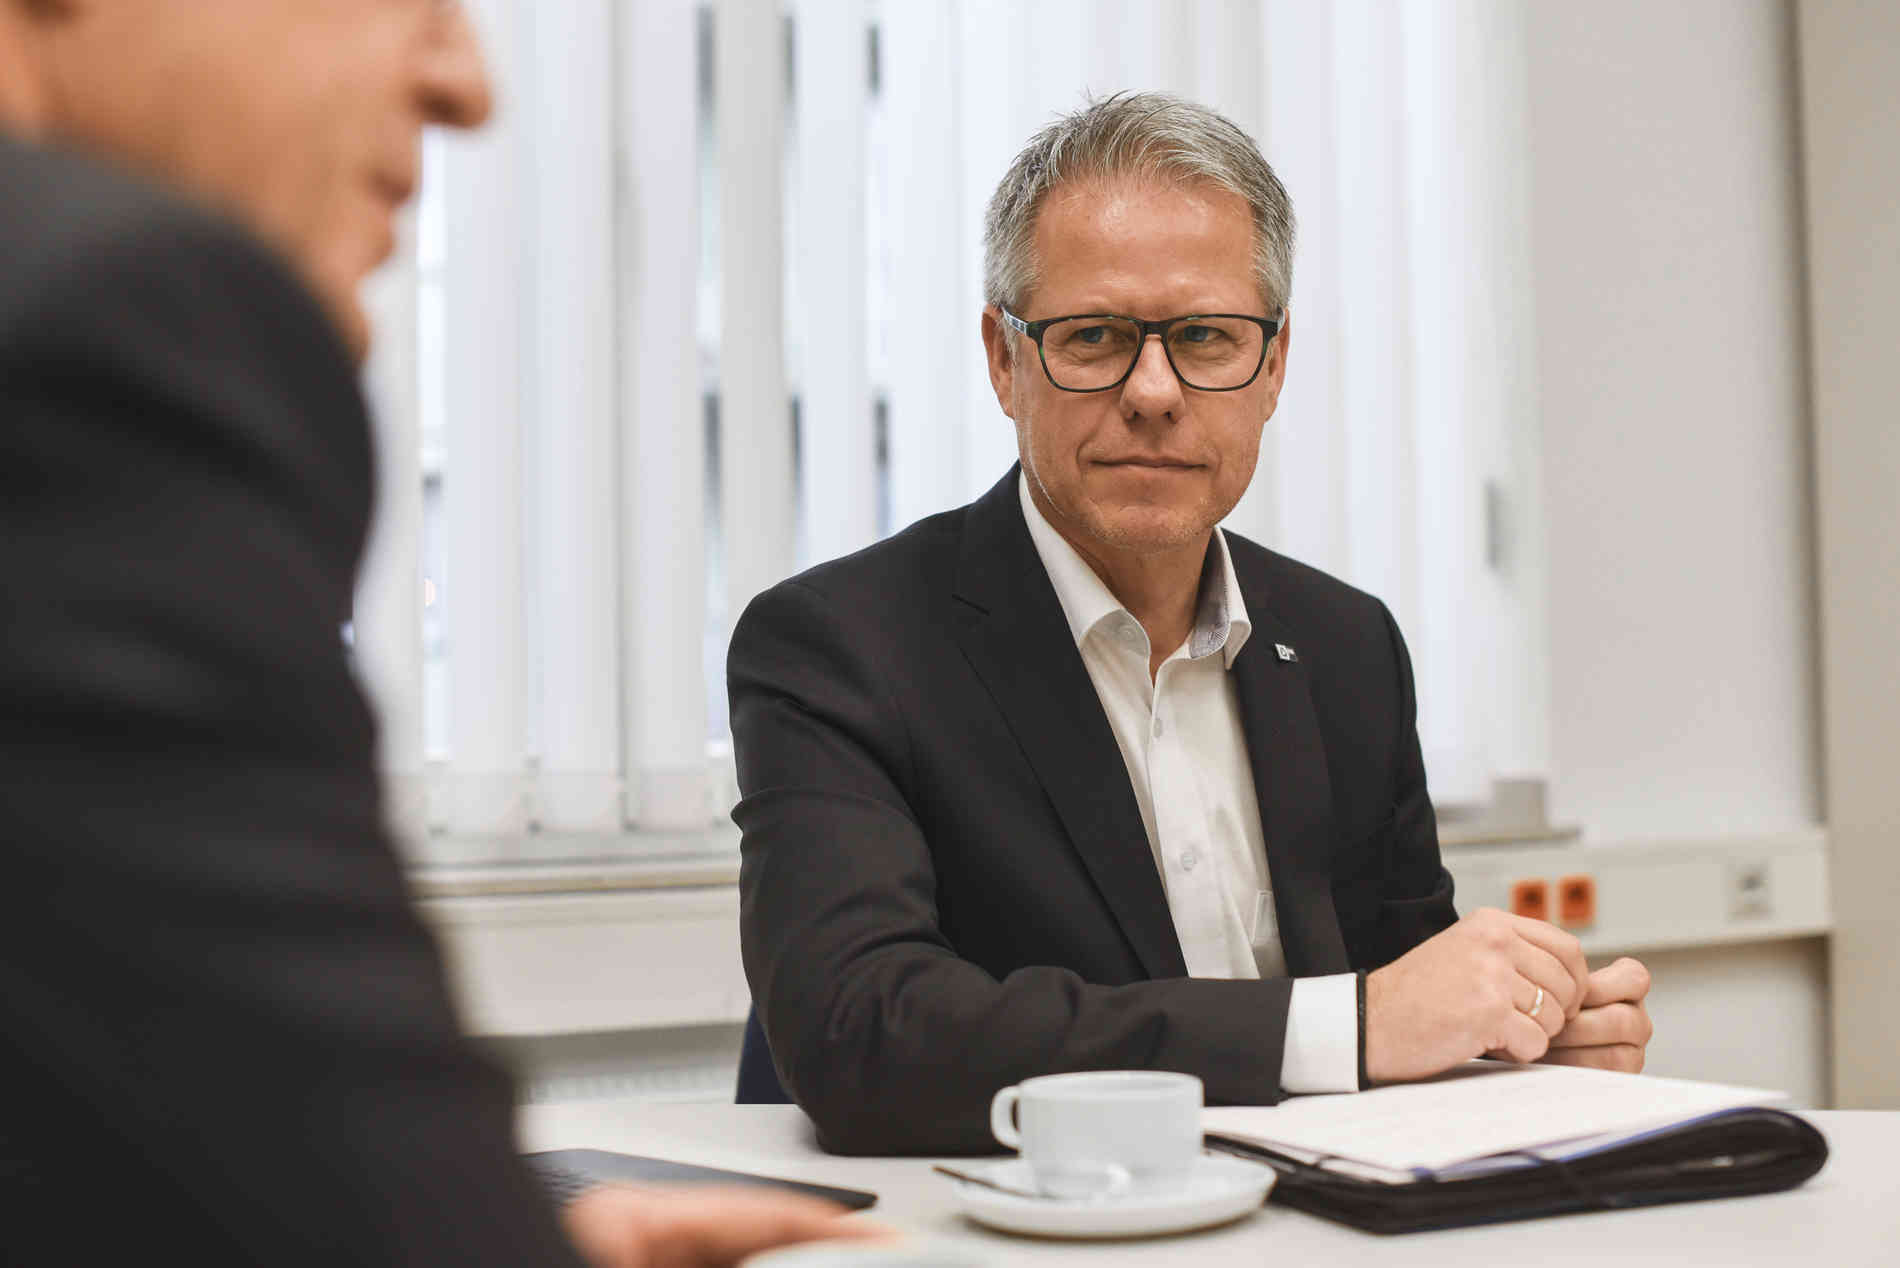 krefeld: podiumsdiskussion des vereins impuls im audi zentrum